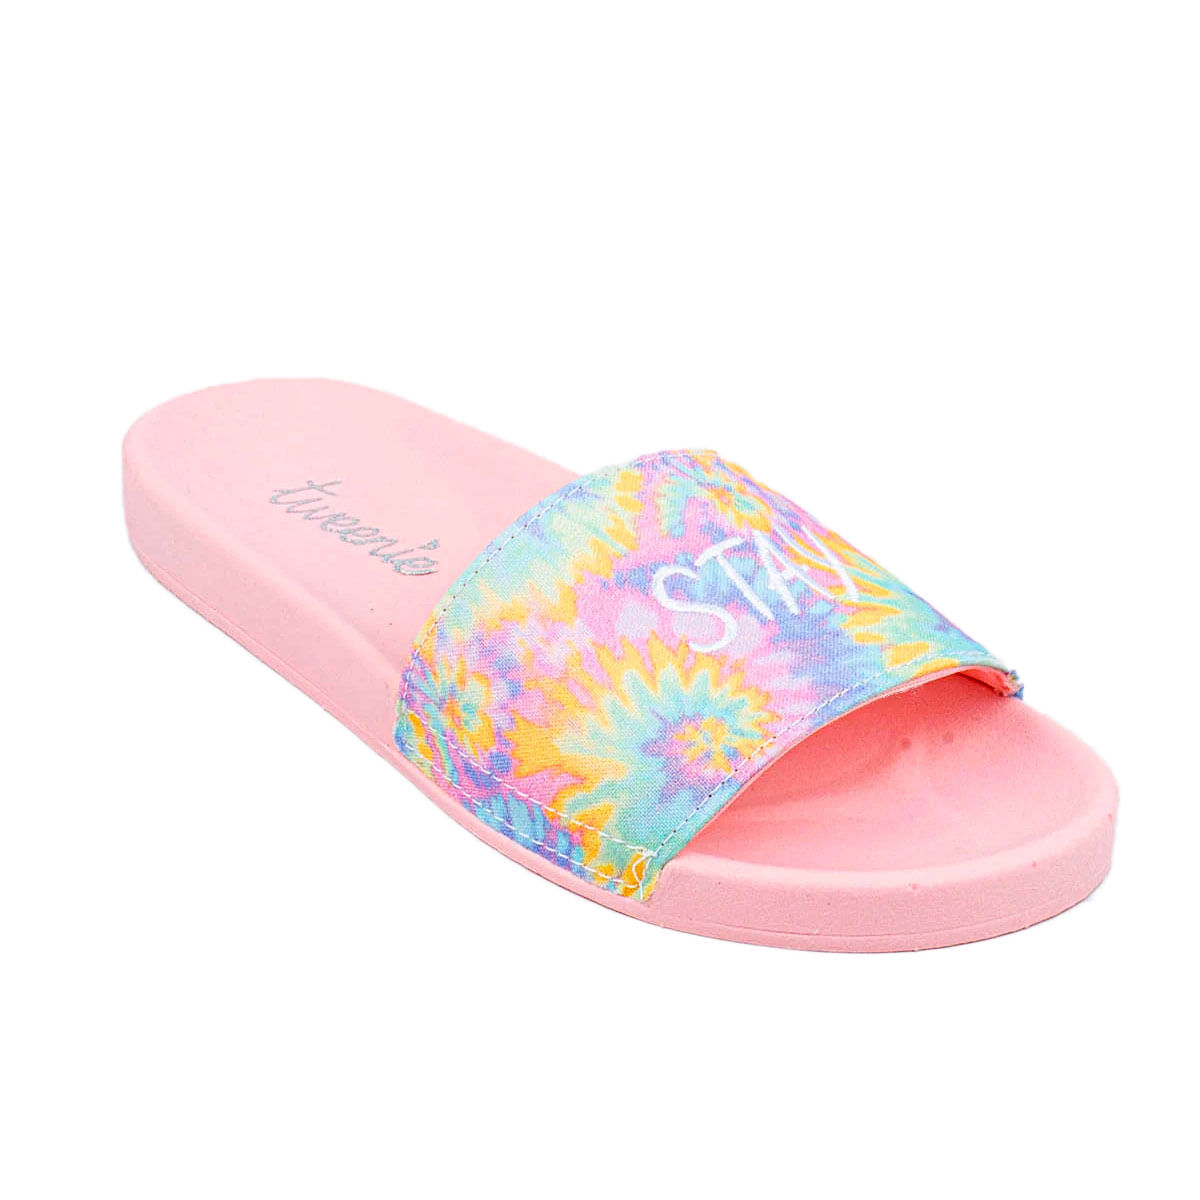 Slide-Infantil-Tie-Dye-Stay-Happy--30-ao-39--508.038--VER21-